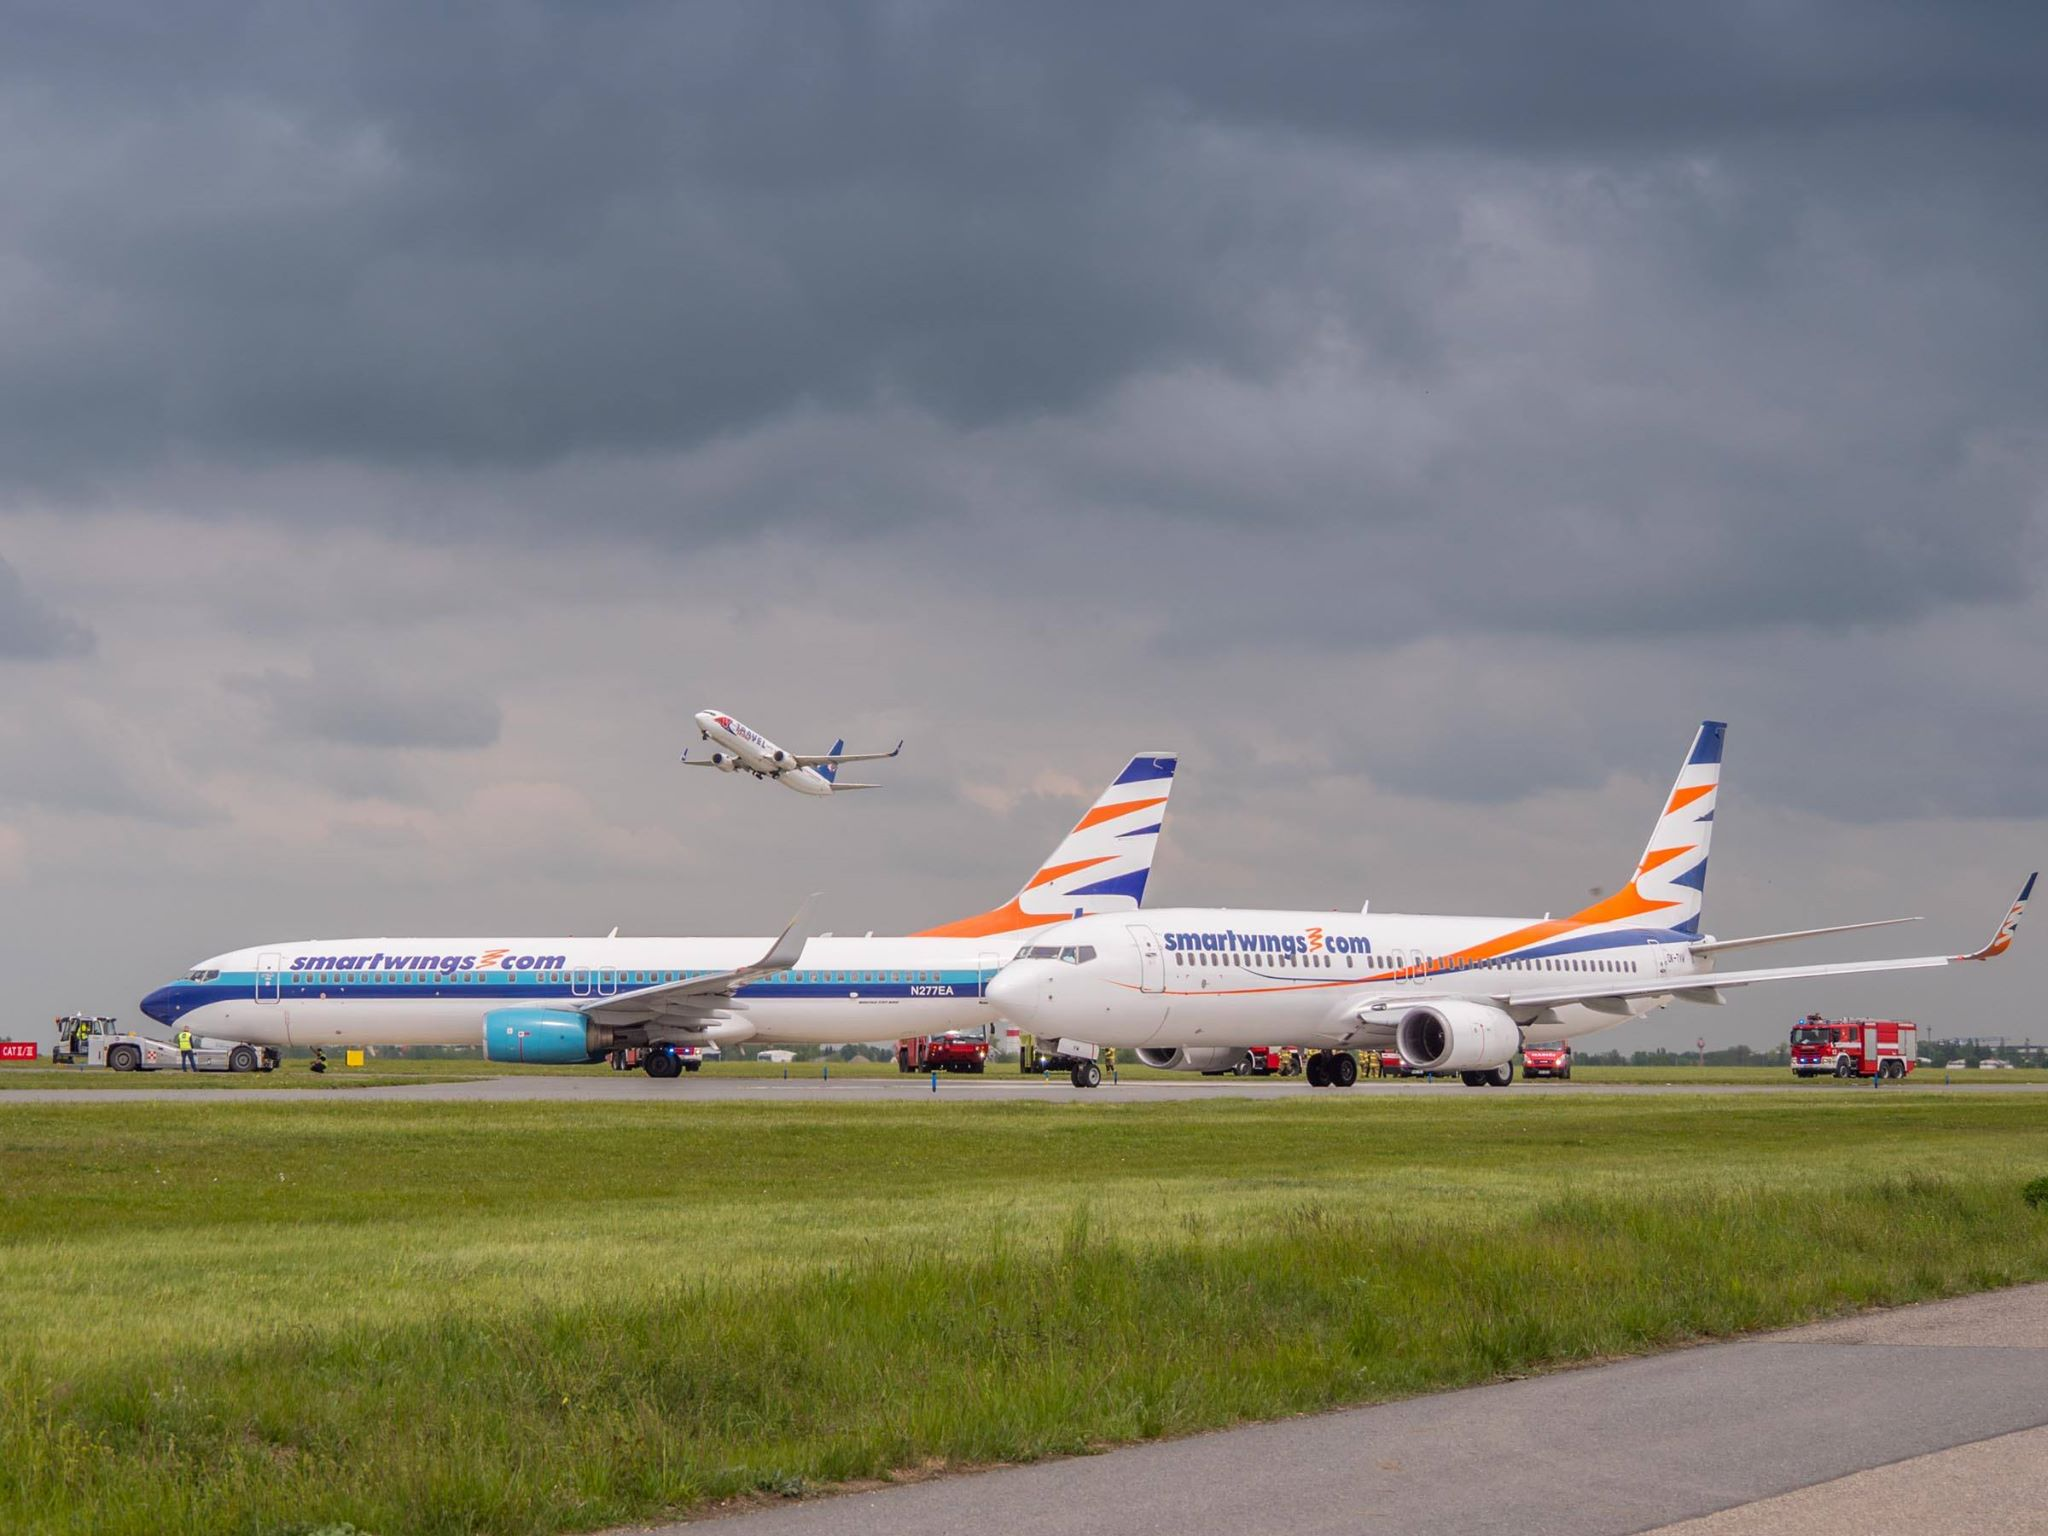 Letadla Smartwings po kolizi na Letišti Praha. Foto: Rosťa Kopecký / Flyrosta.com